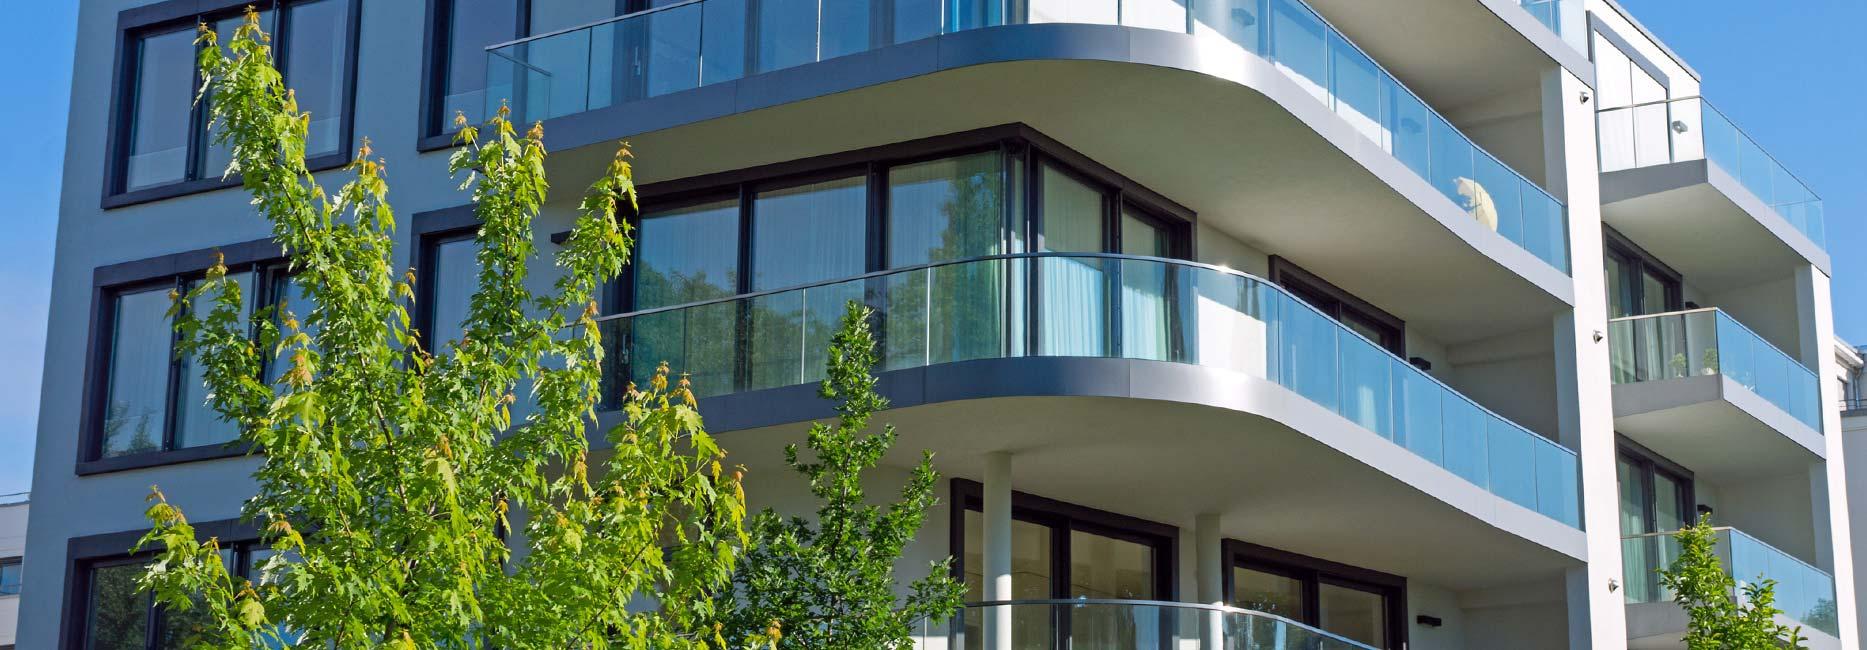 bsb-balkonsysteme